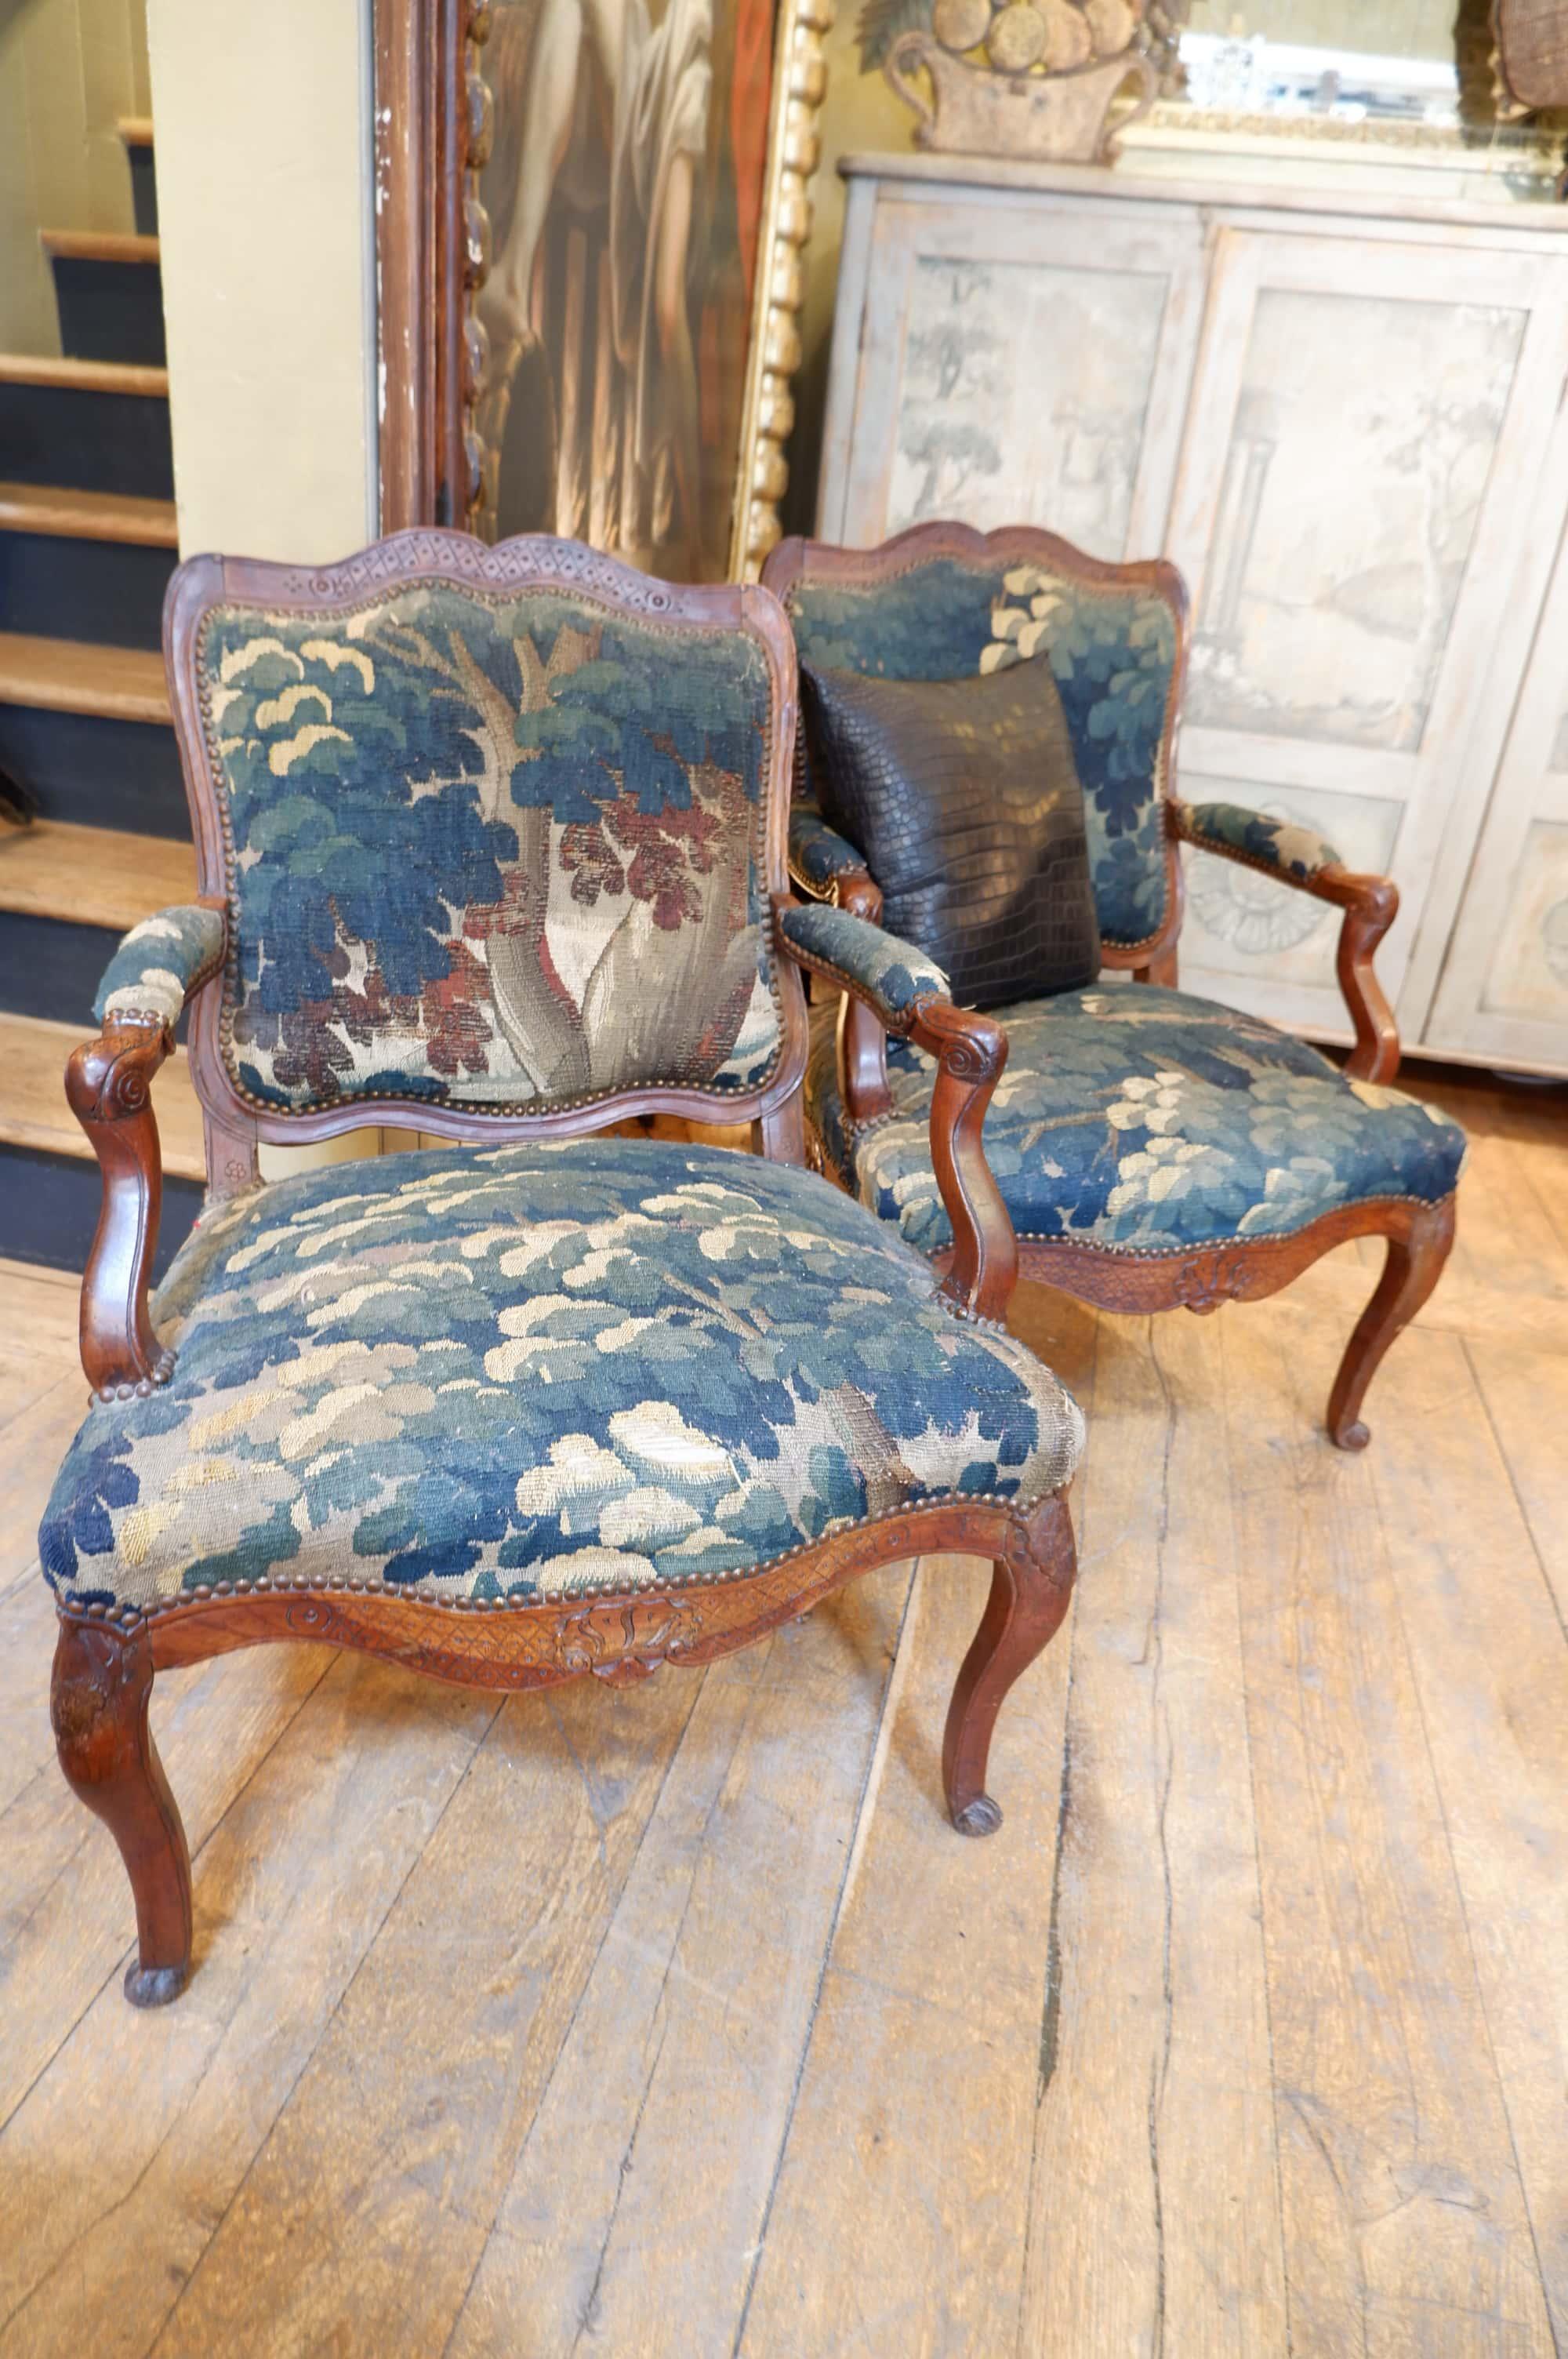 Paire de fauteuils en noyer recouverts de tapisseries en verdures ca.1750